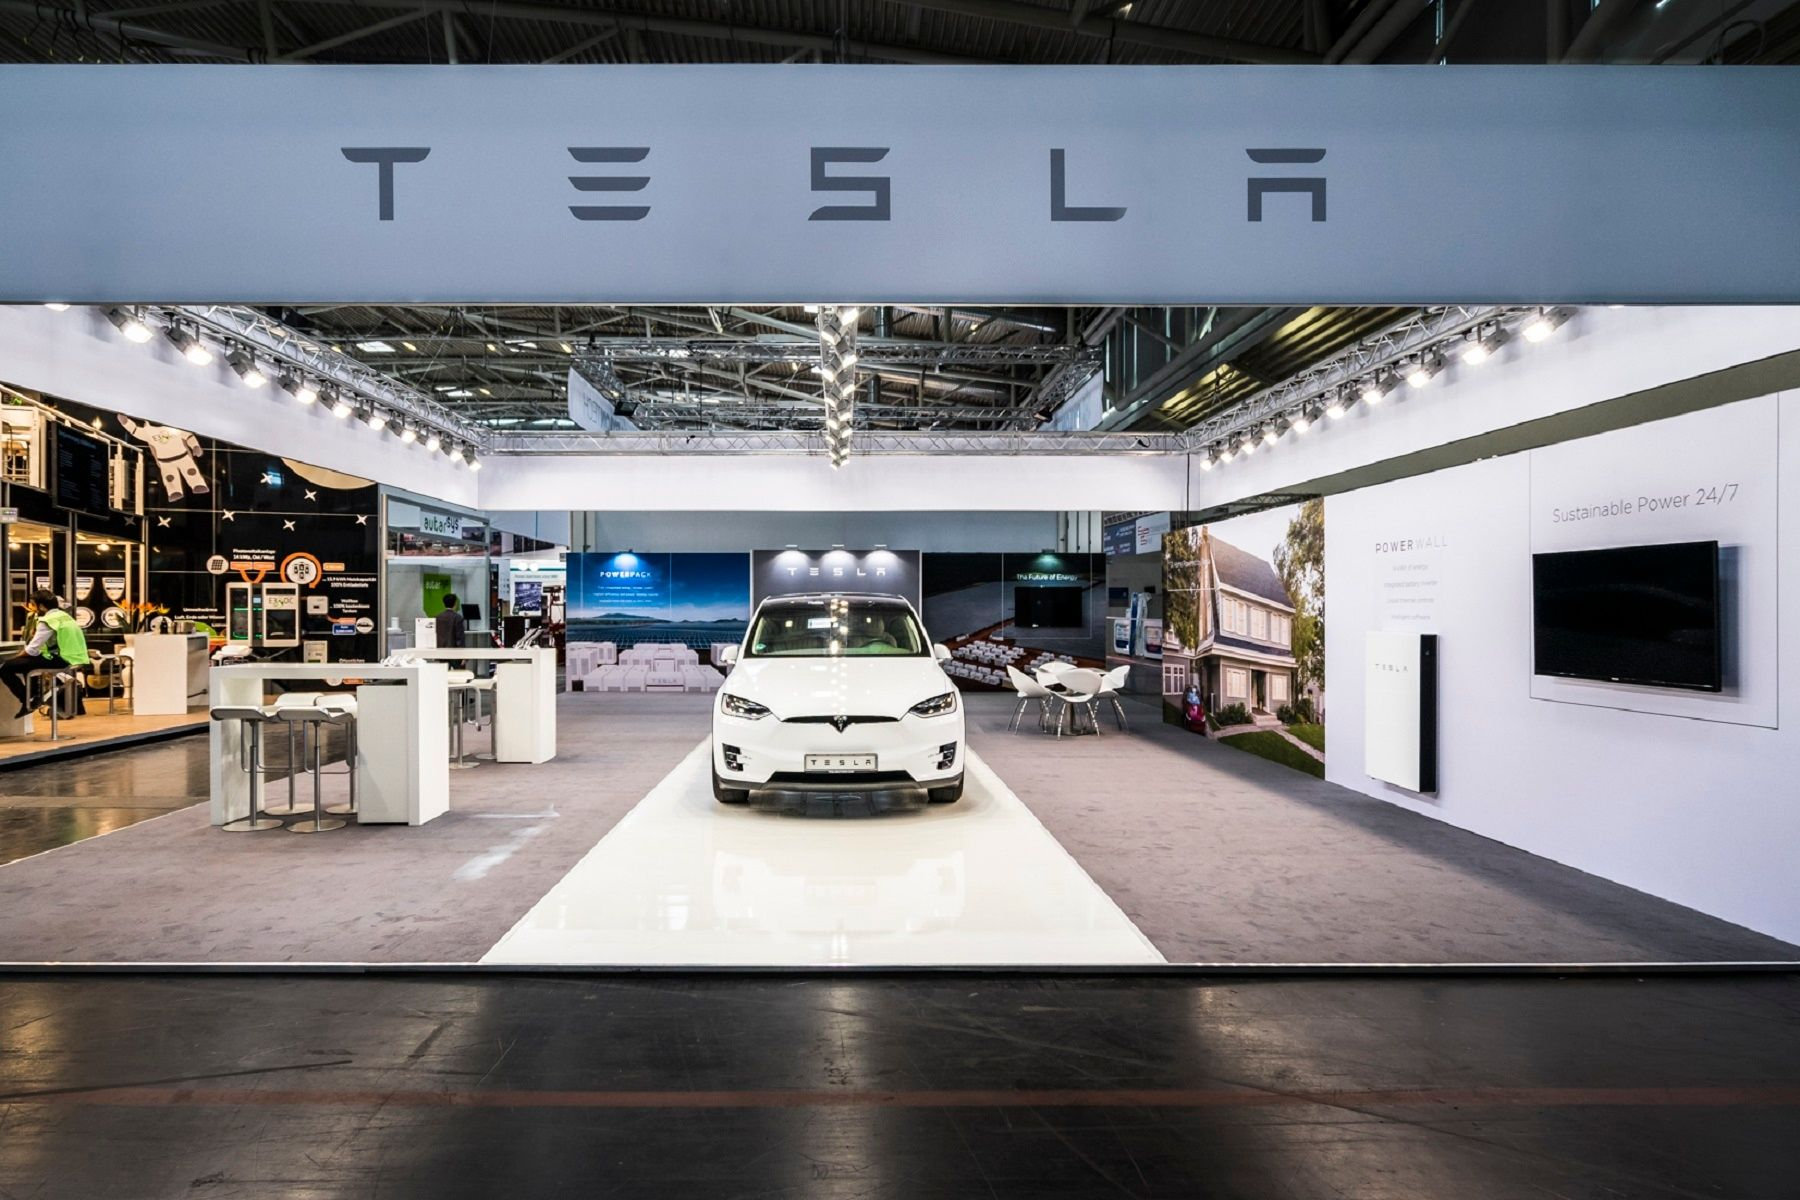 Booth construction RocketExpo Intersolar München Tesla